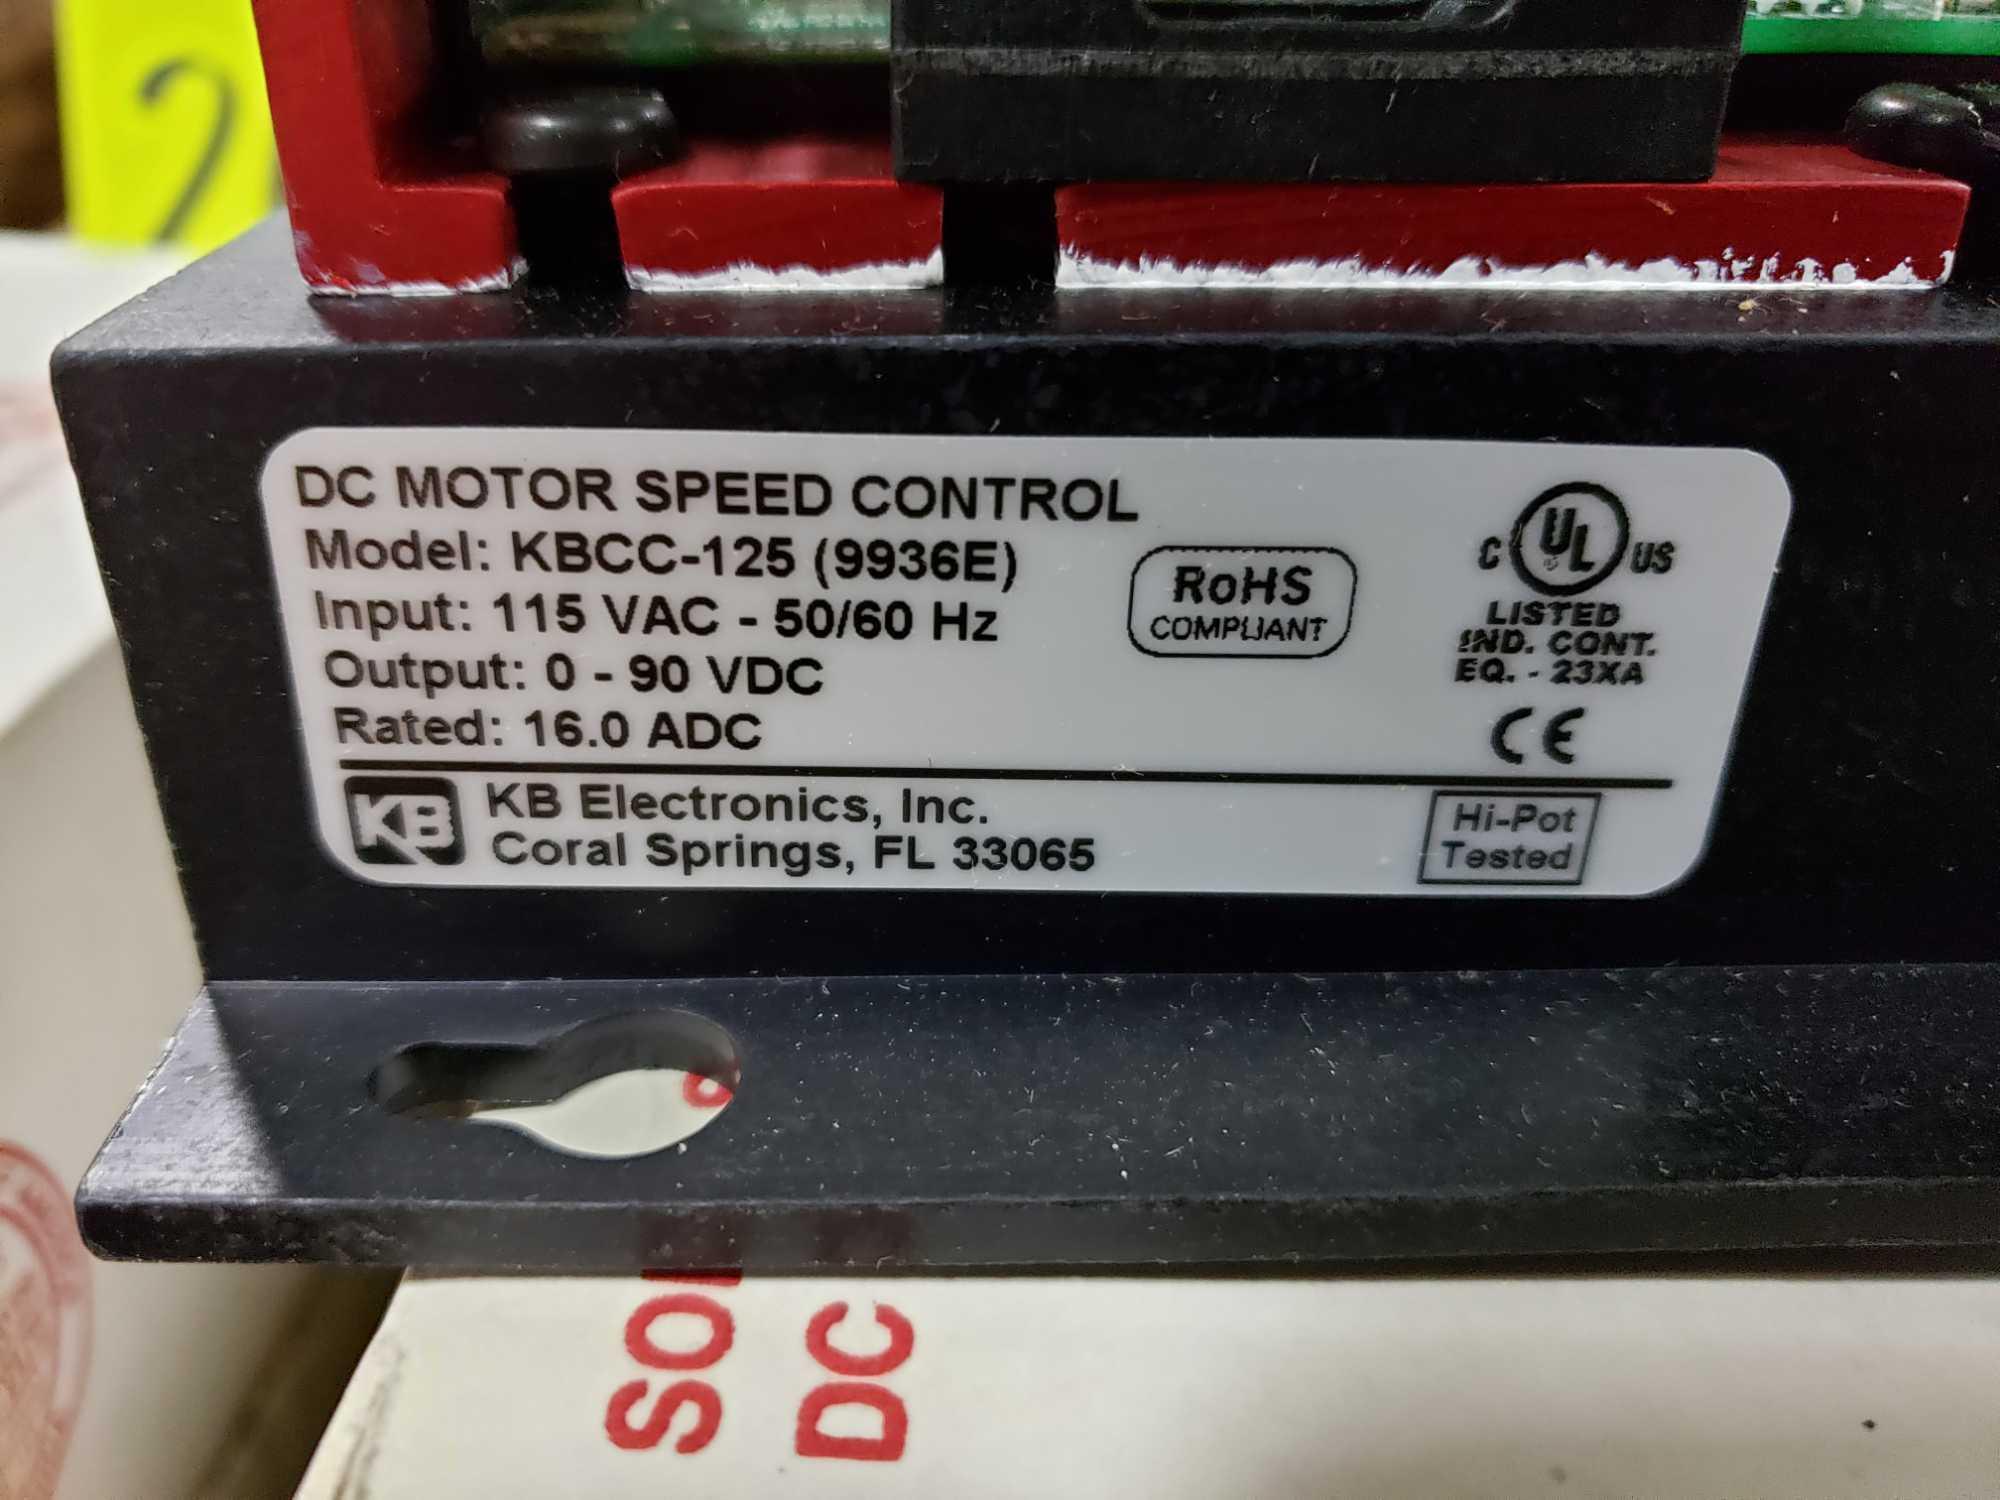 KB Penta Power reversing controld drive. Model KBCC-125, part 9936ED. New in box. - Image 3 of 4